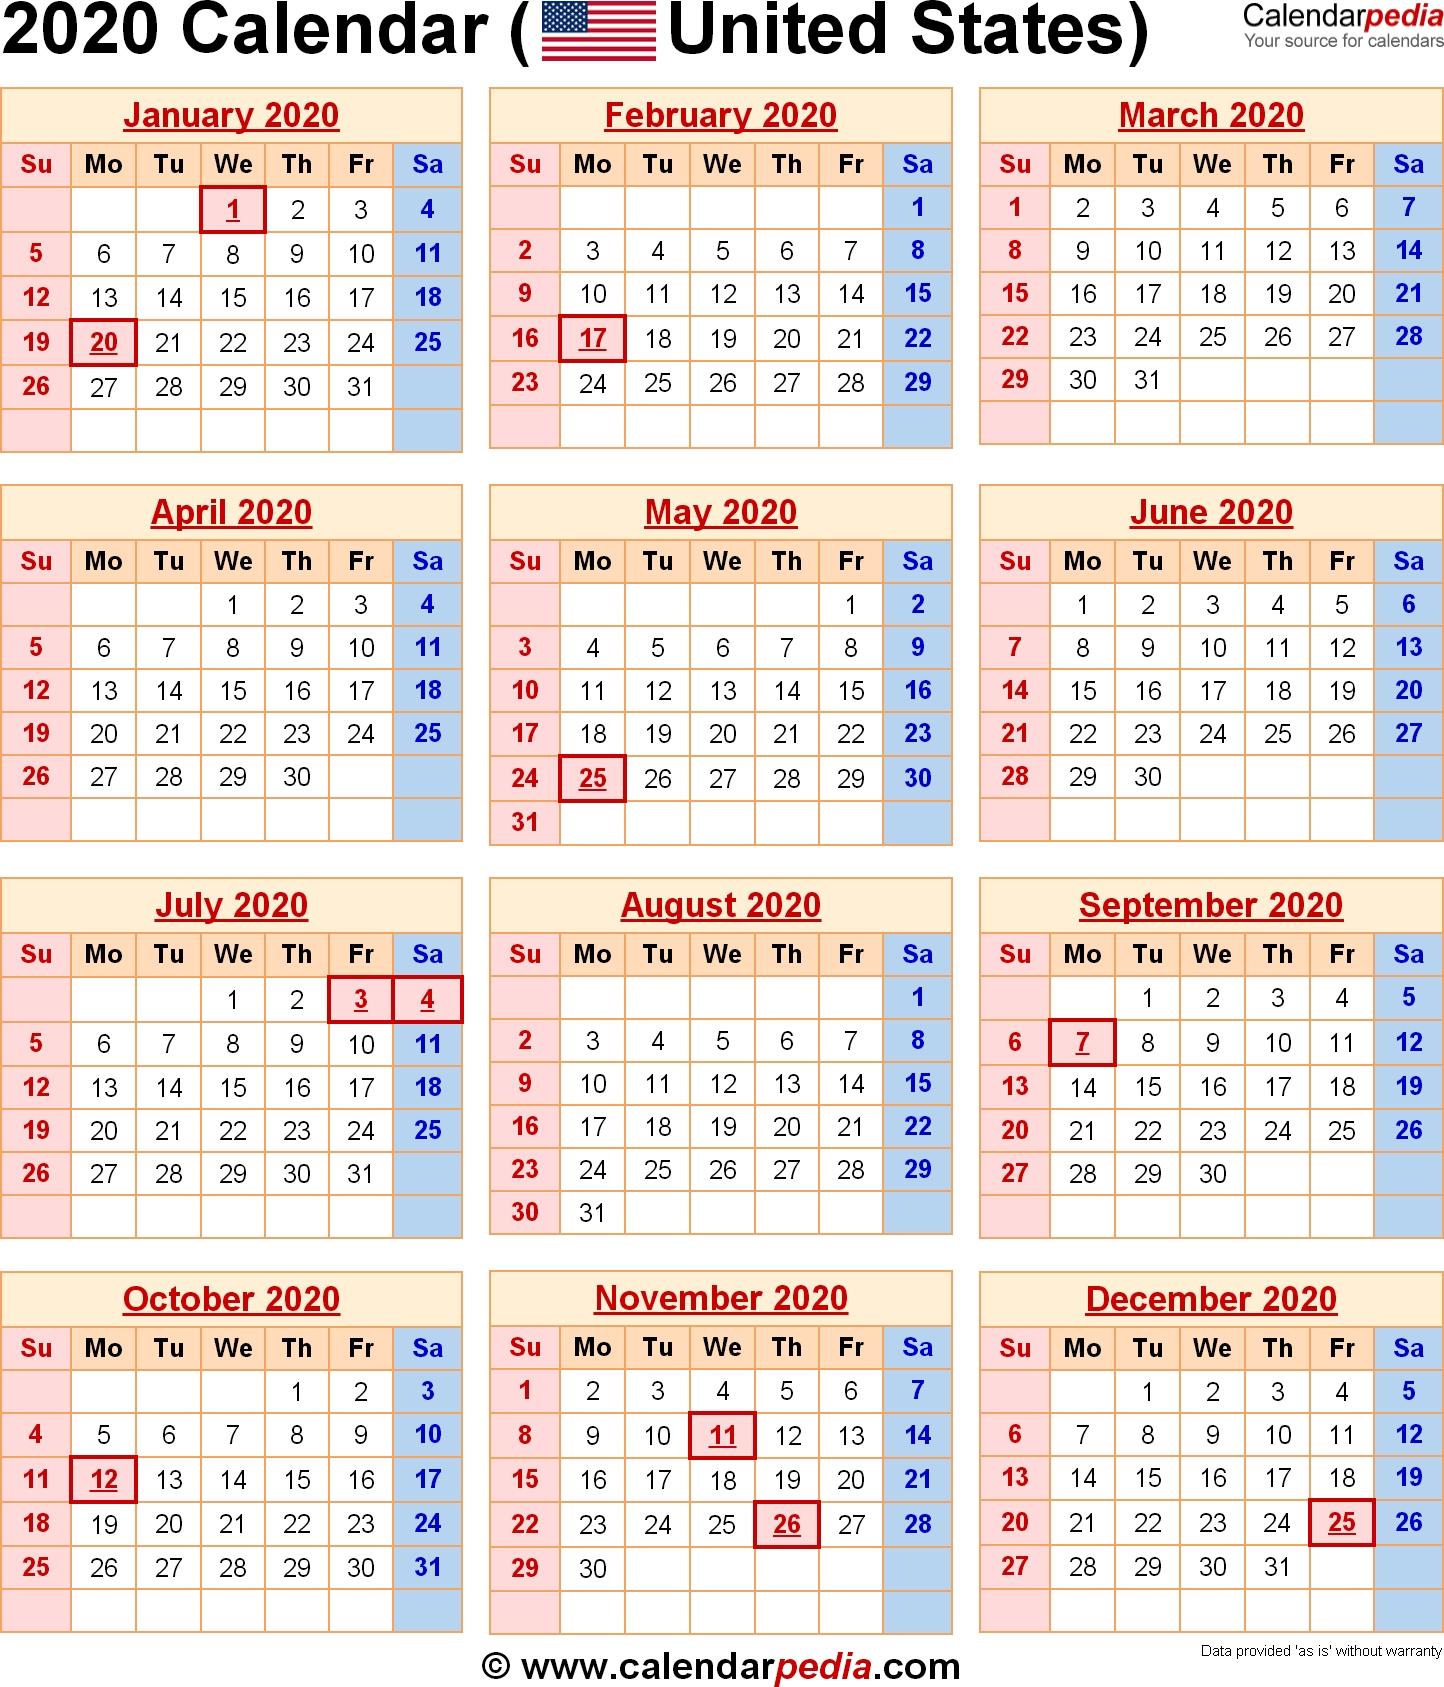 Perky 2020 Calendar Year At A Glance • Printable Blank Calendar Template for Excel Calendar At A Glance 2020